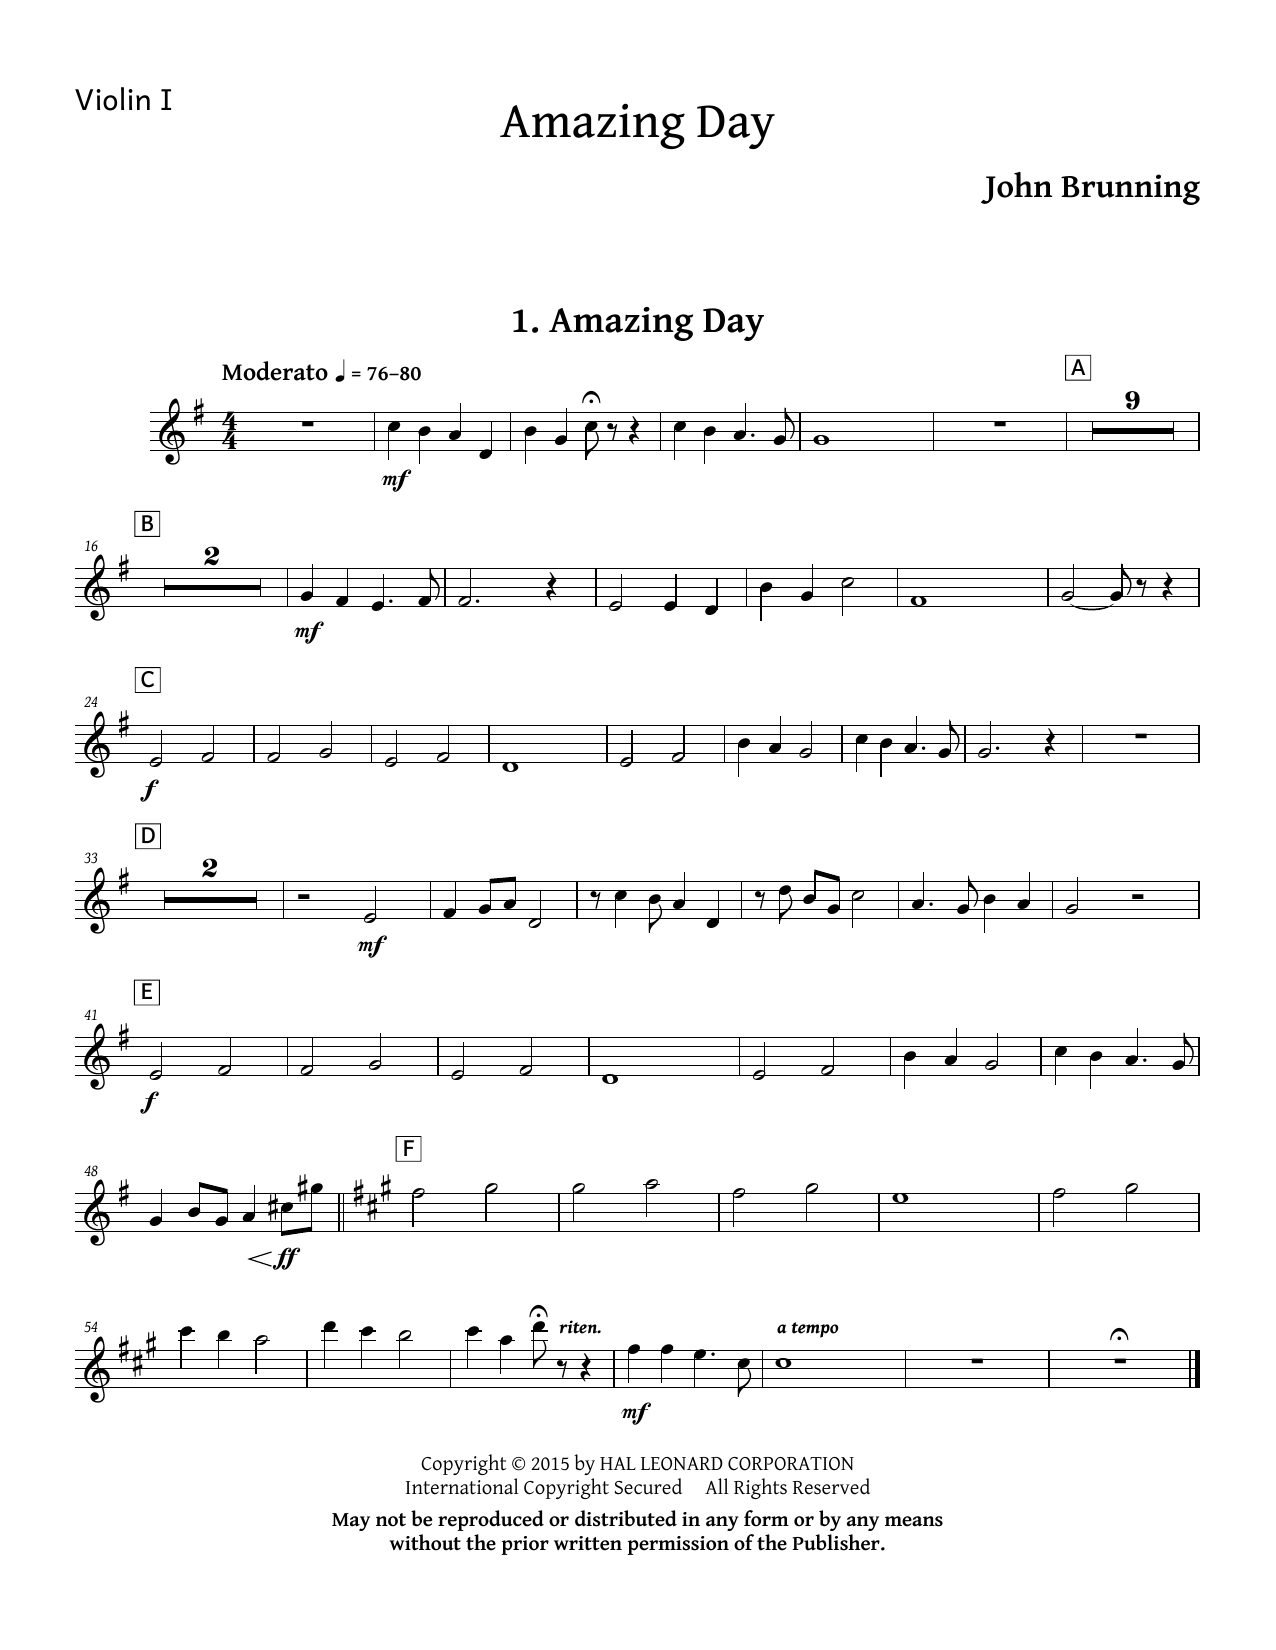 Amazing Day - Violin 1 Sheet Music